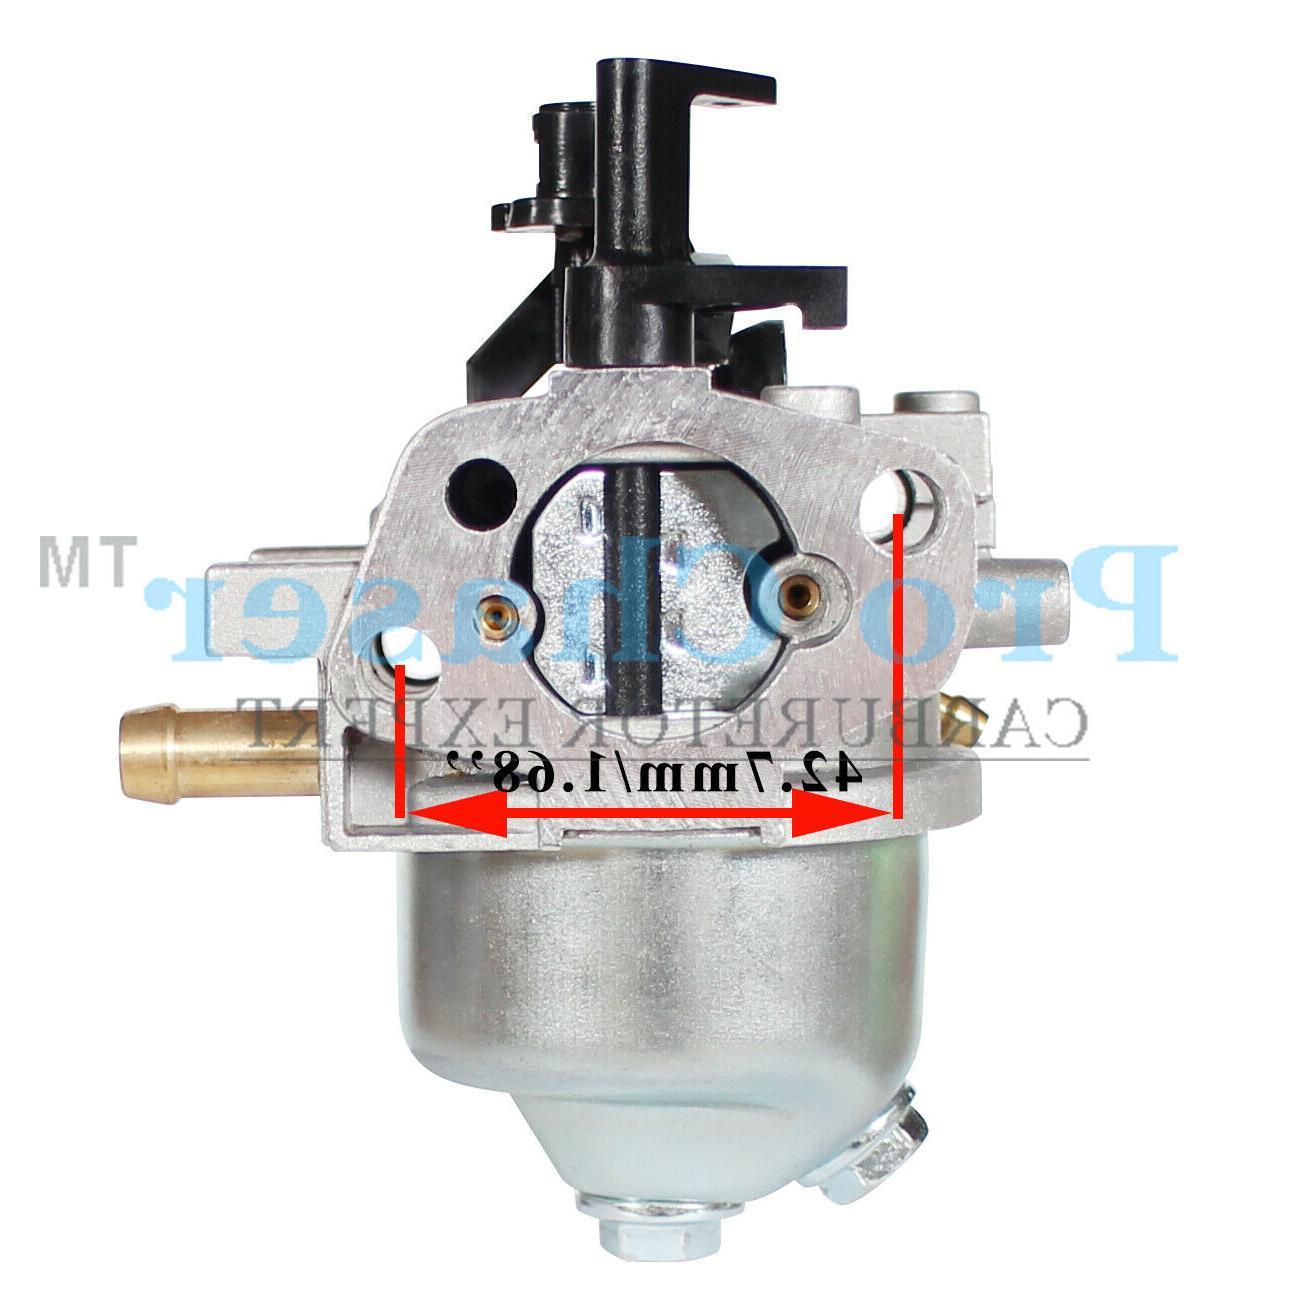 Carburetor For Model 20370 149cc Lawn Mower Carb